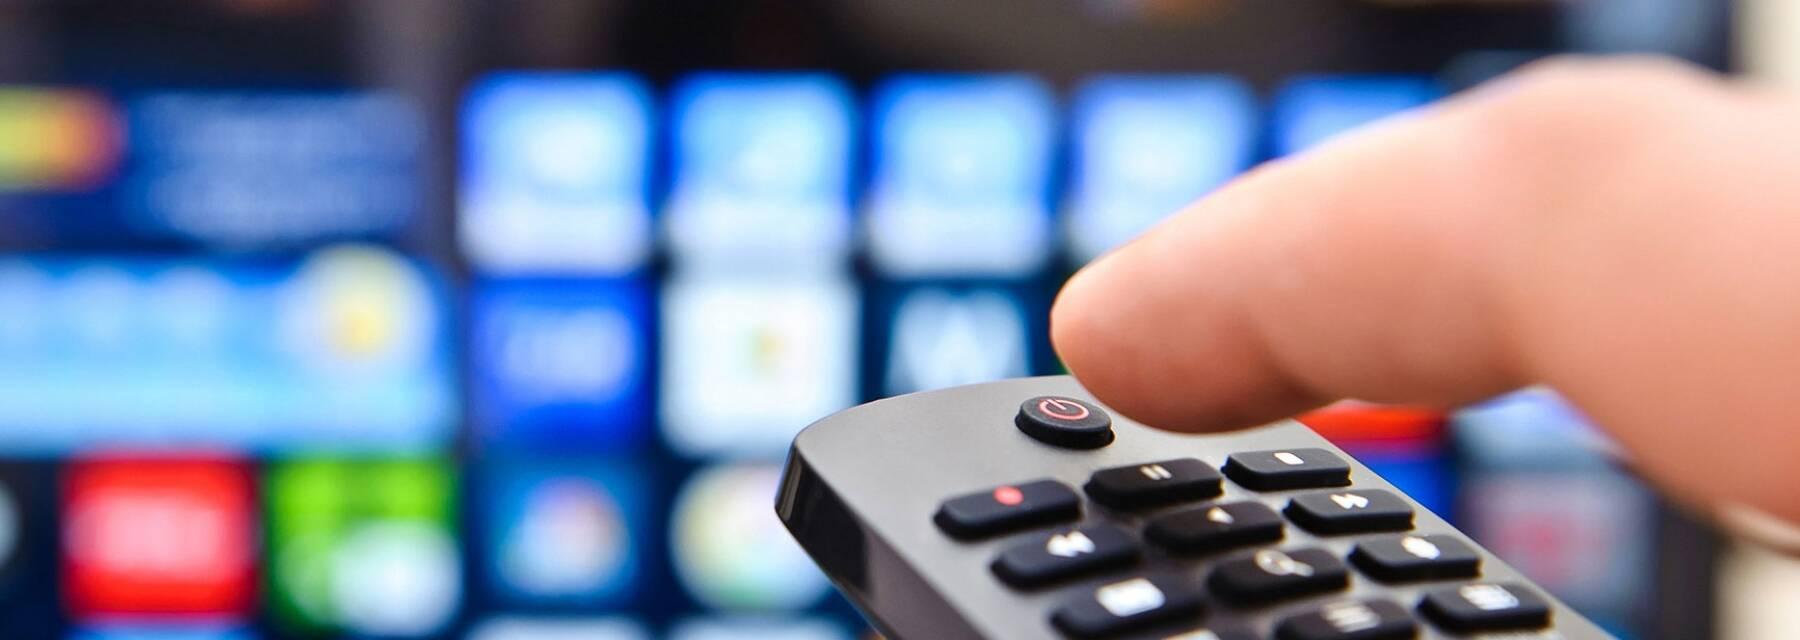 Smart TV Application Development services